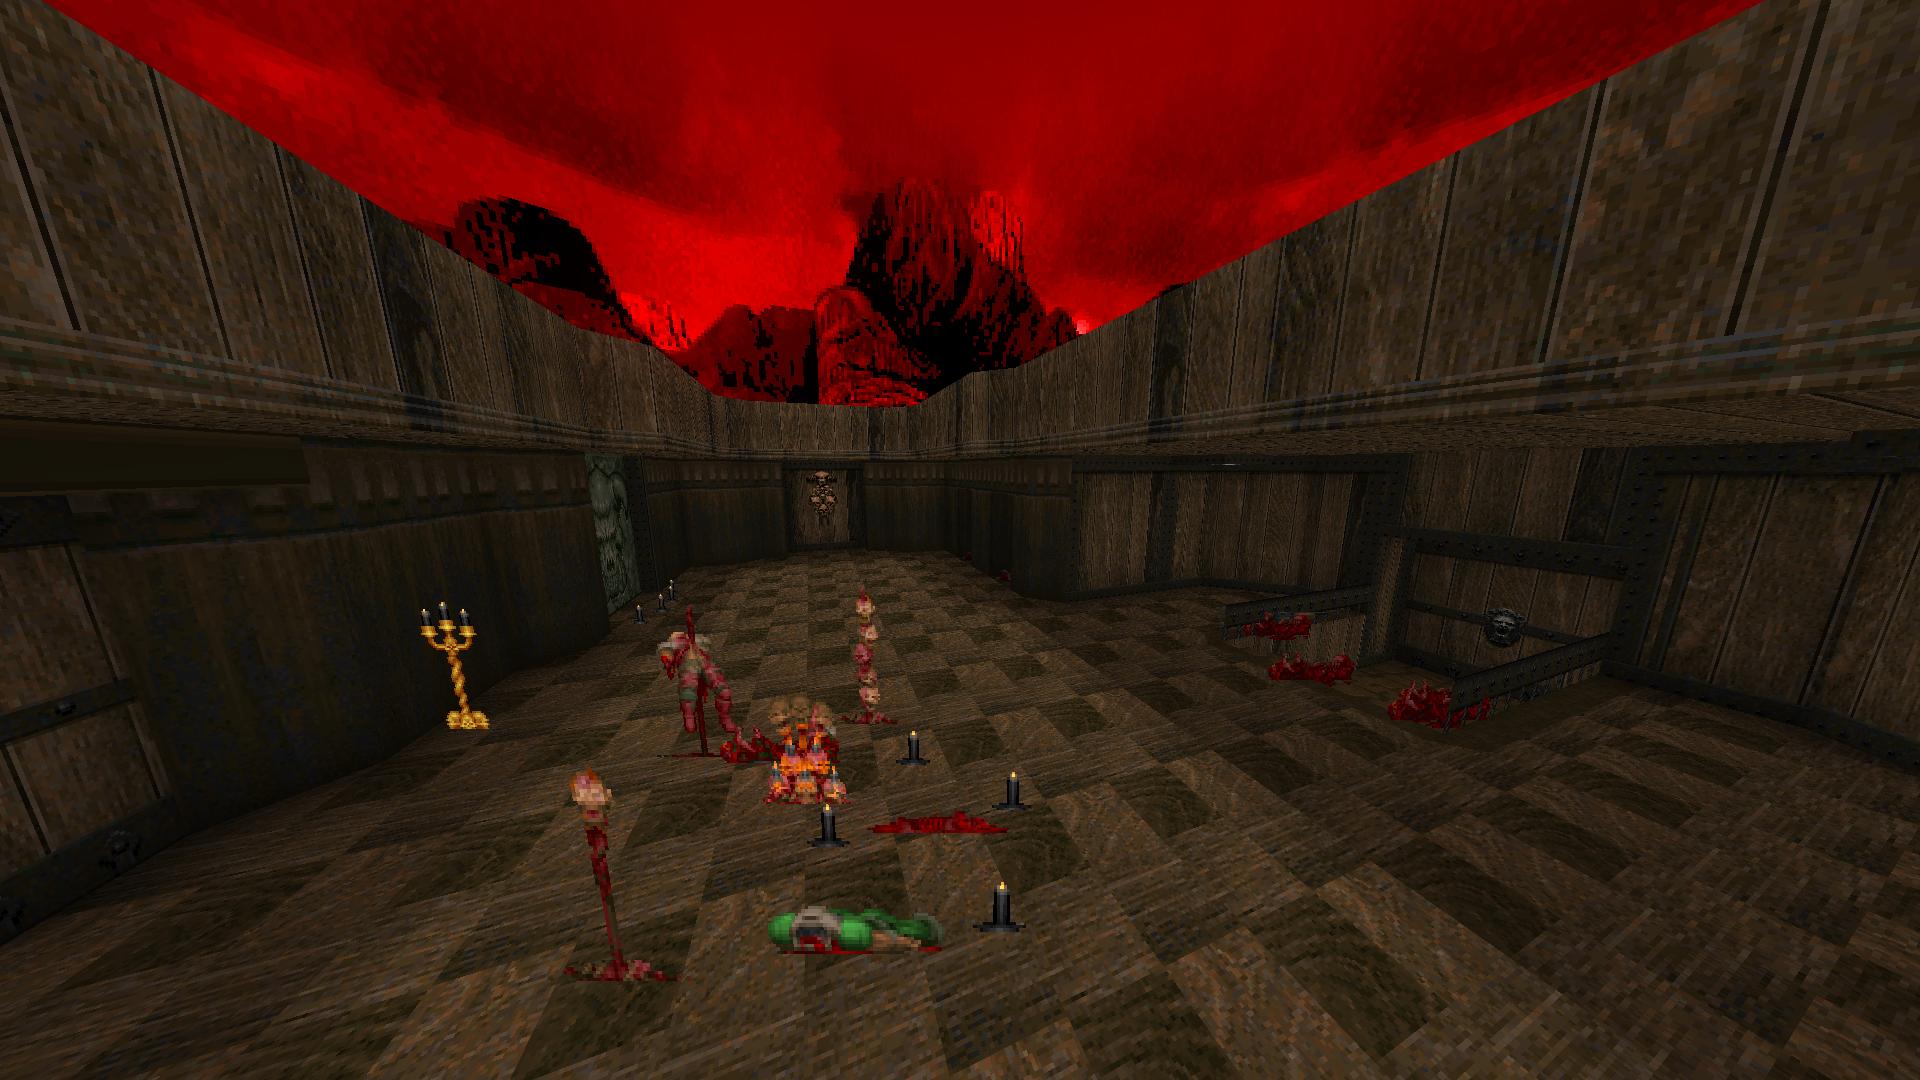 Screenshot_Doom_20210504_153419.png.fb5ae0741d63adccf82c37a806ebefa7.png